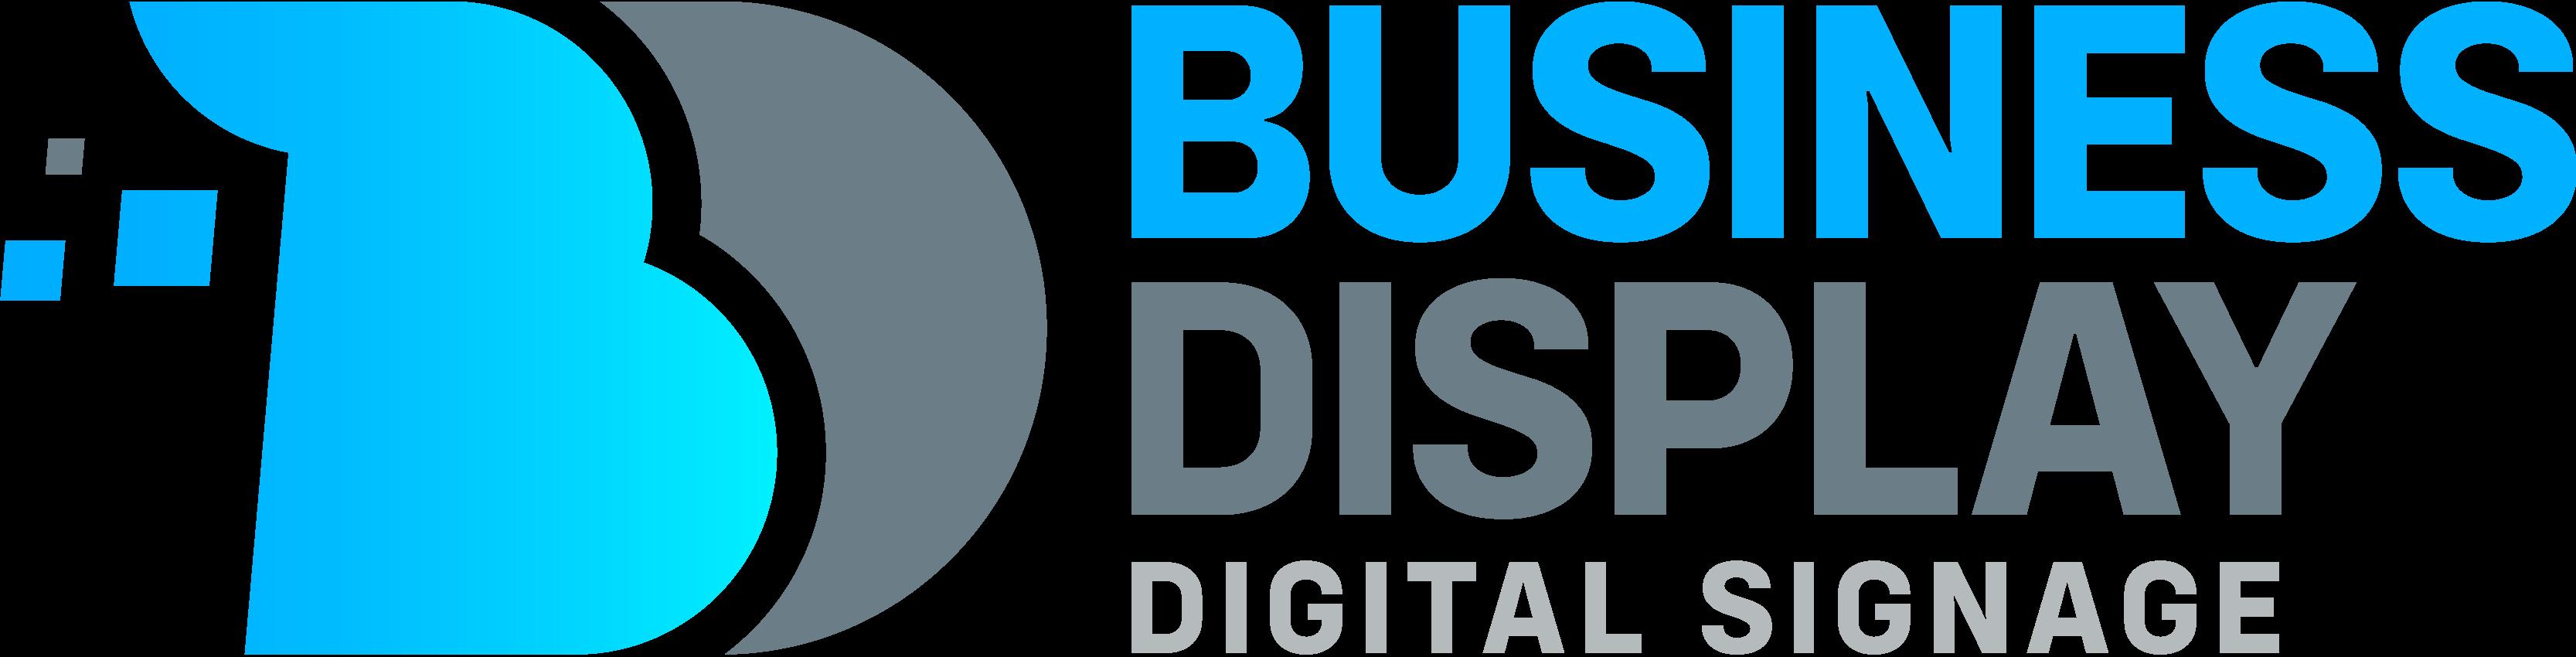 logo-business-display